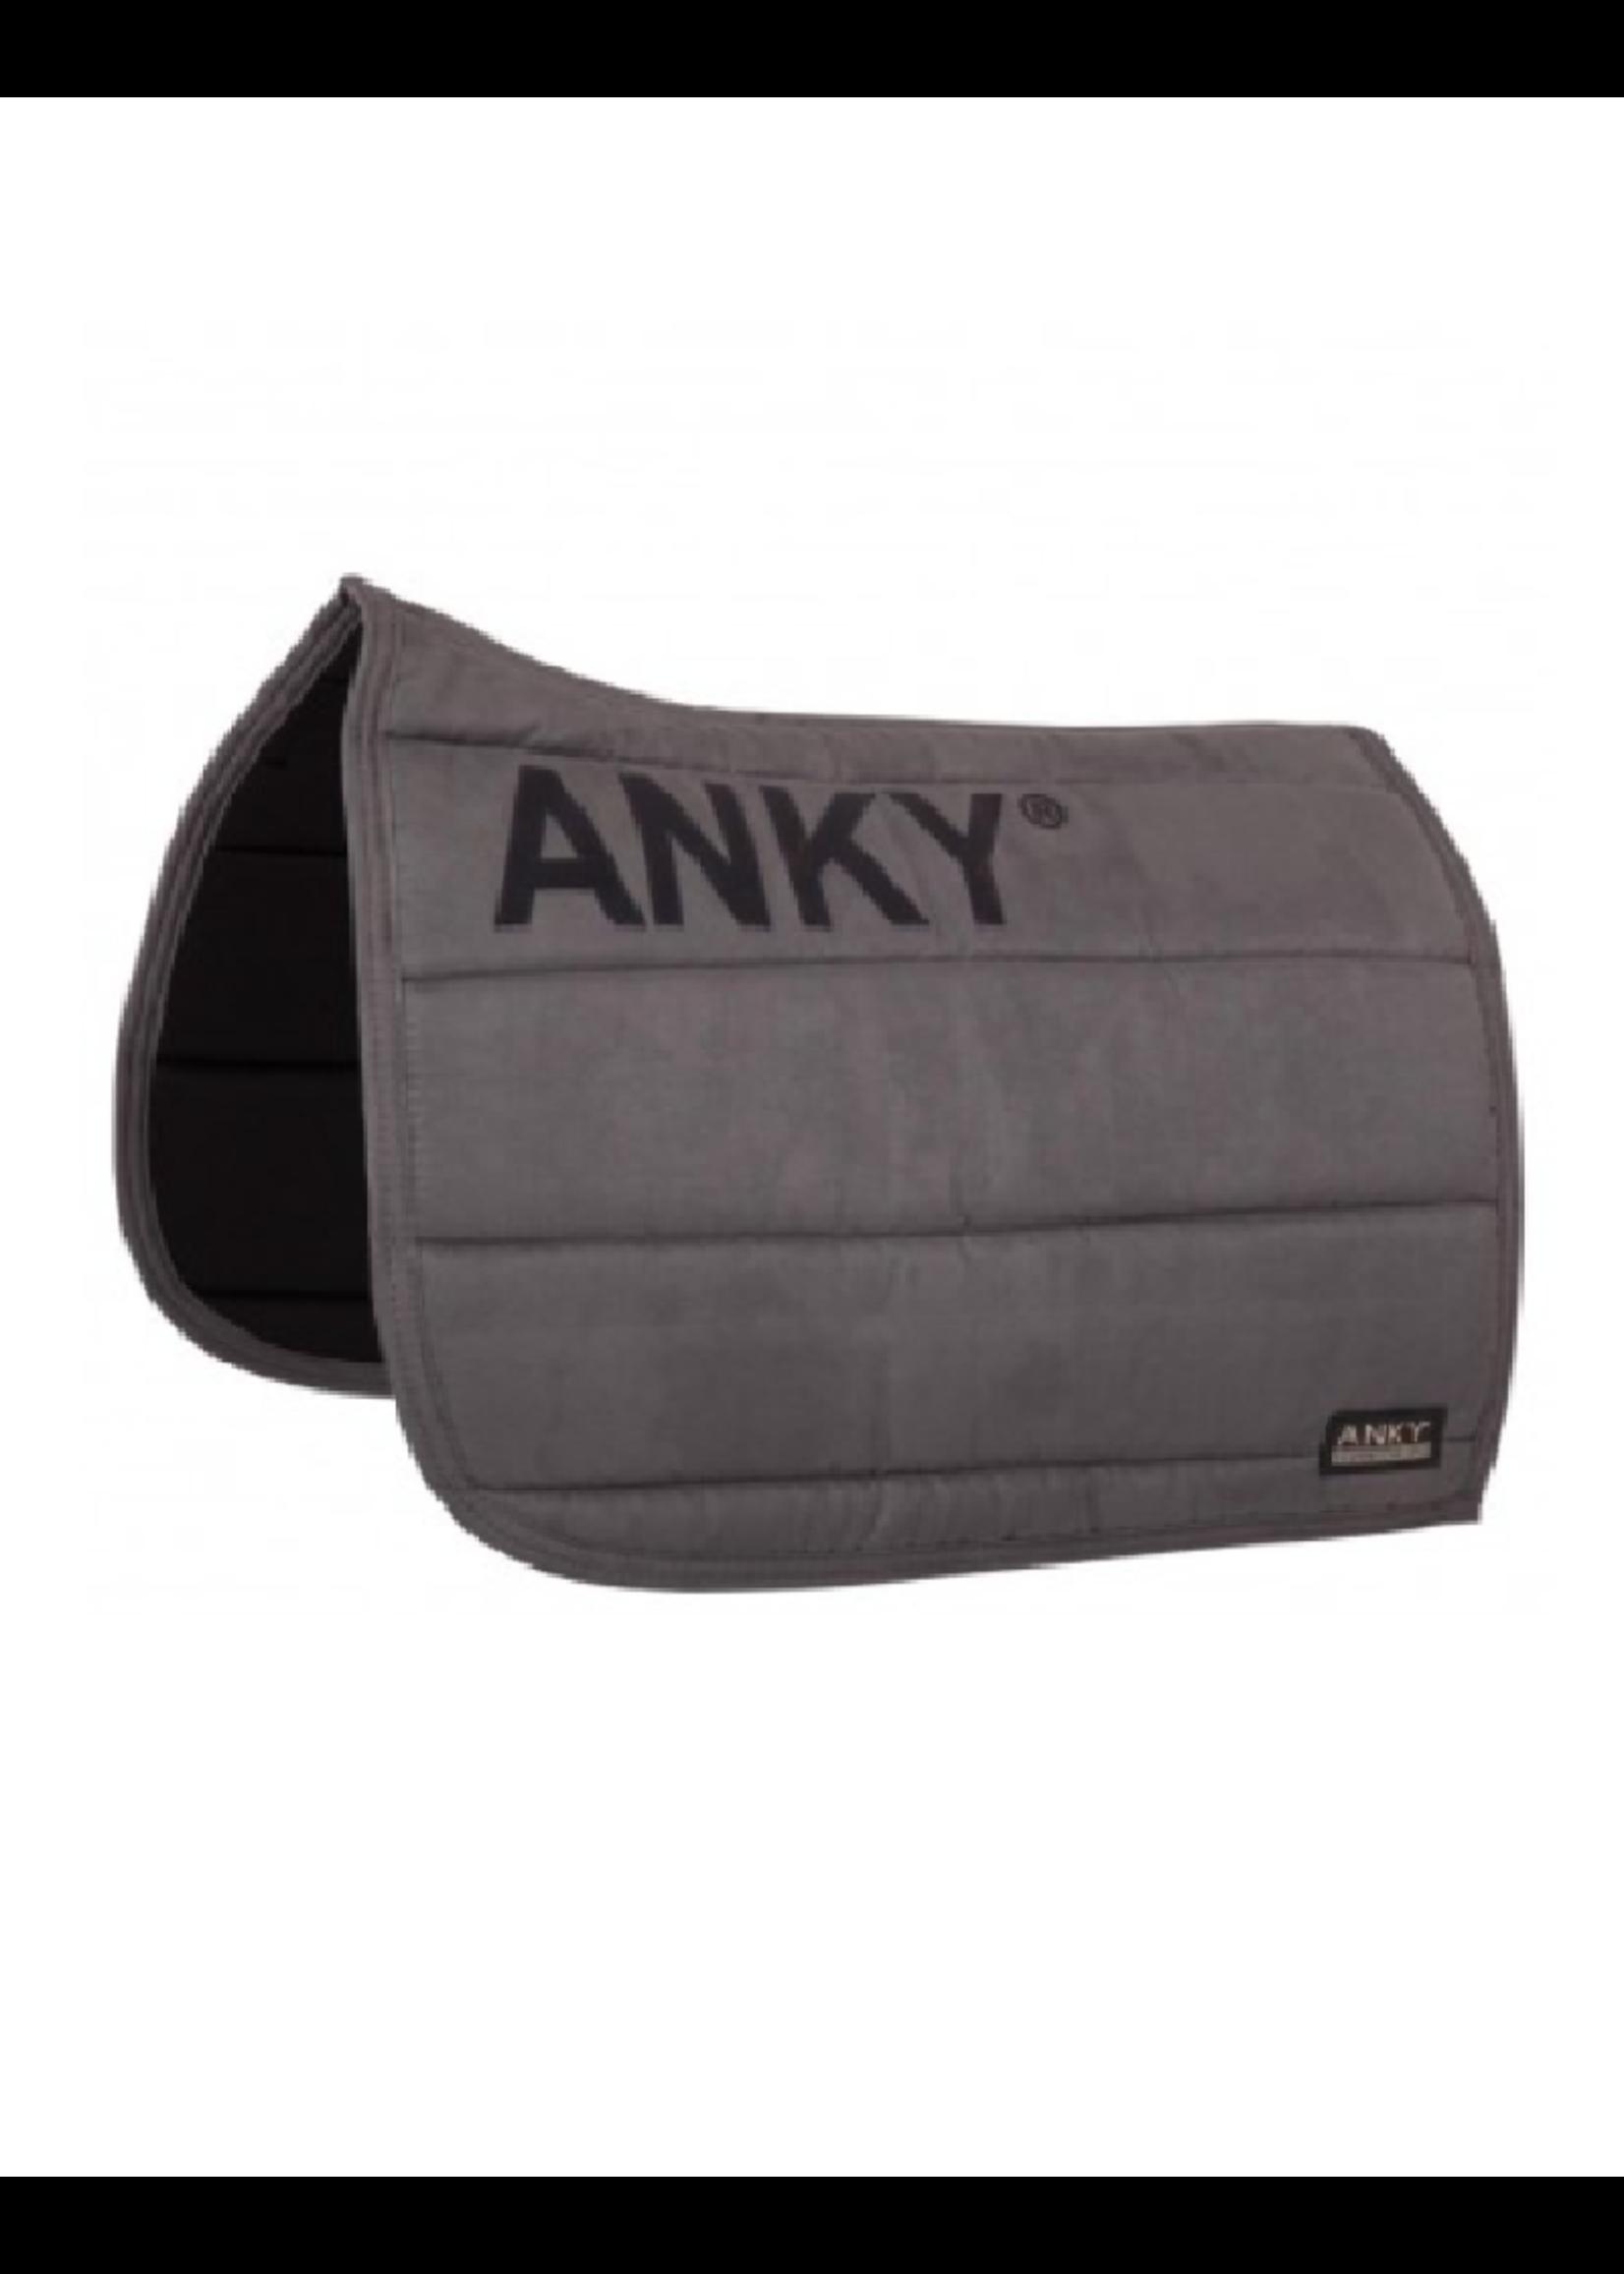 Anky Anky Dekje Dressuur